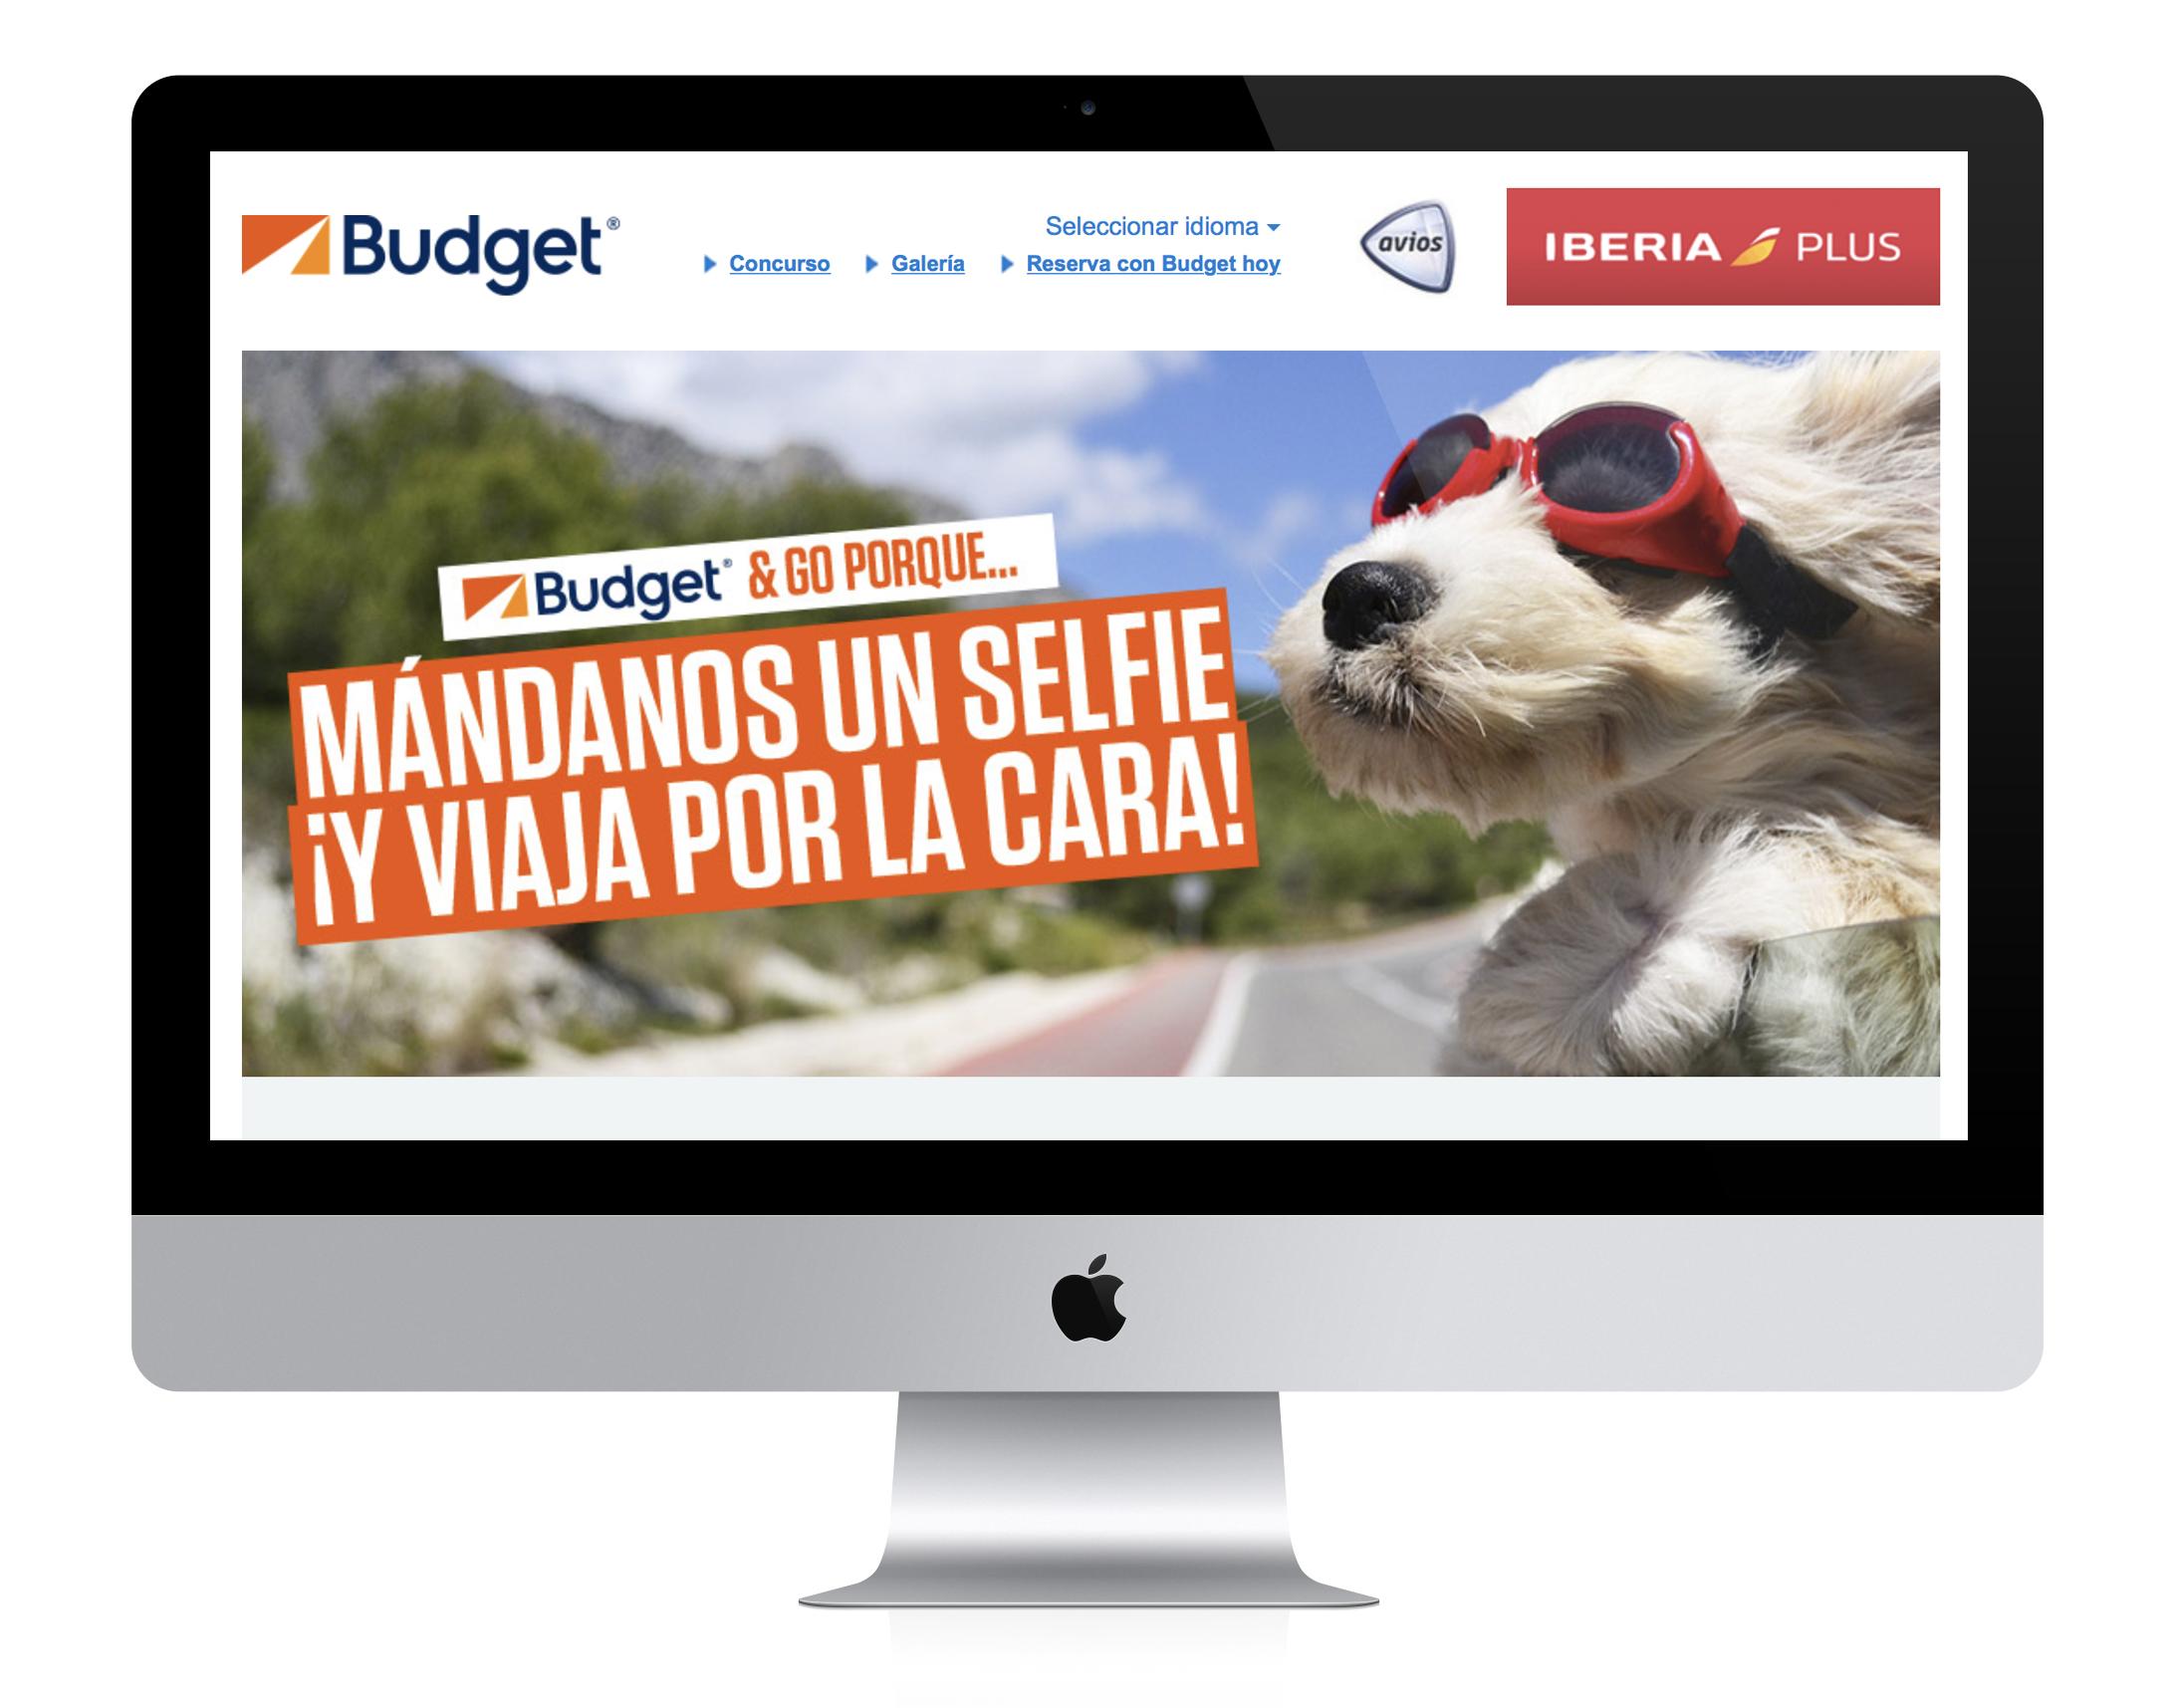 iMac-2012-big--budget2.jpg